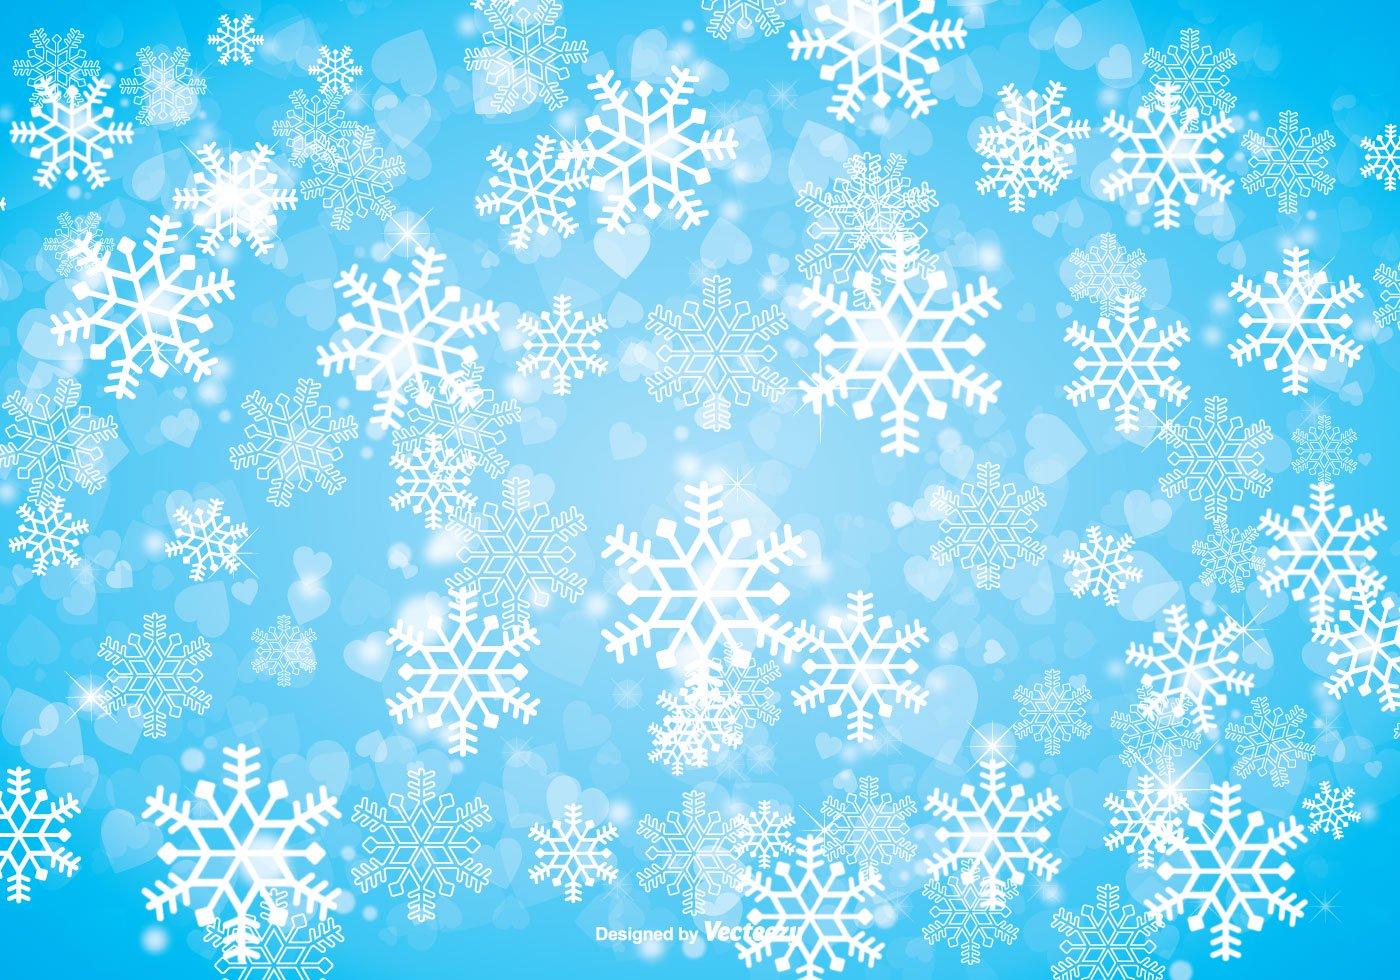 Winter Snowflake Background   Download Vector Art 1400x980